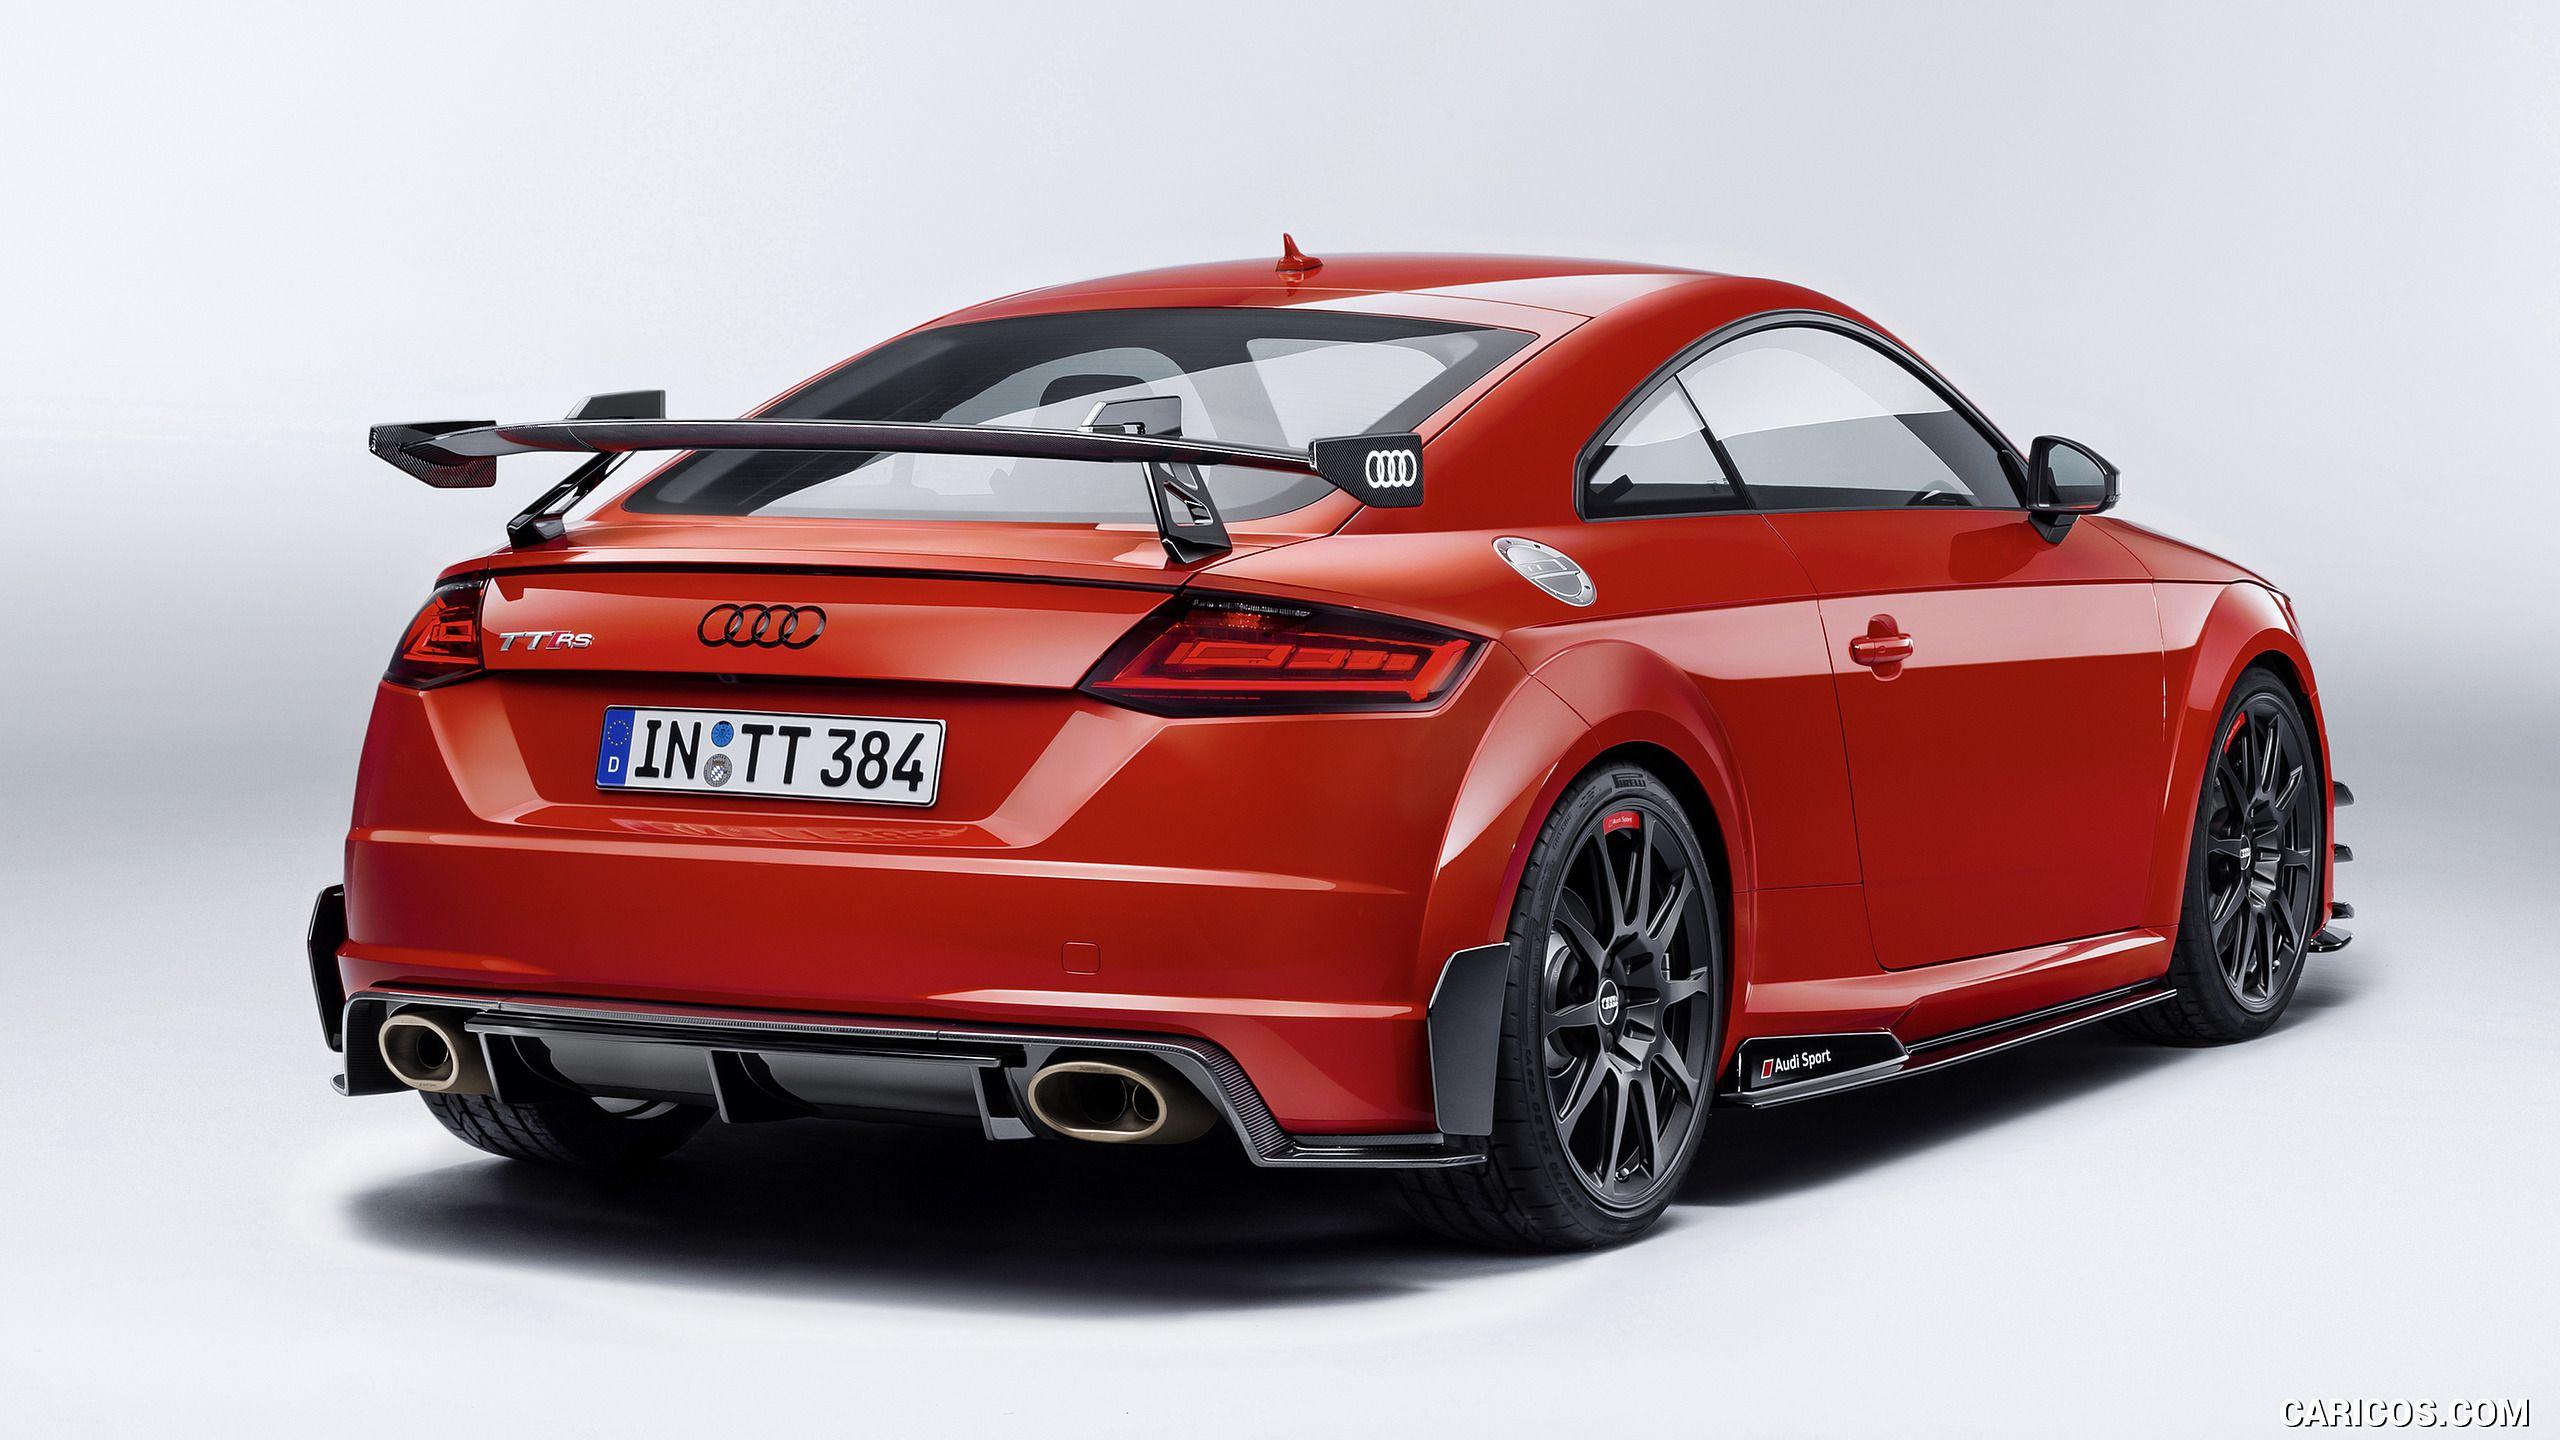 Next Stop Pinterest Audi Tt Audi Tt Rs Audi Tt Sport